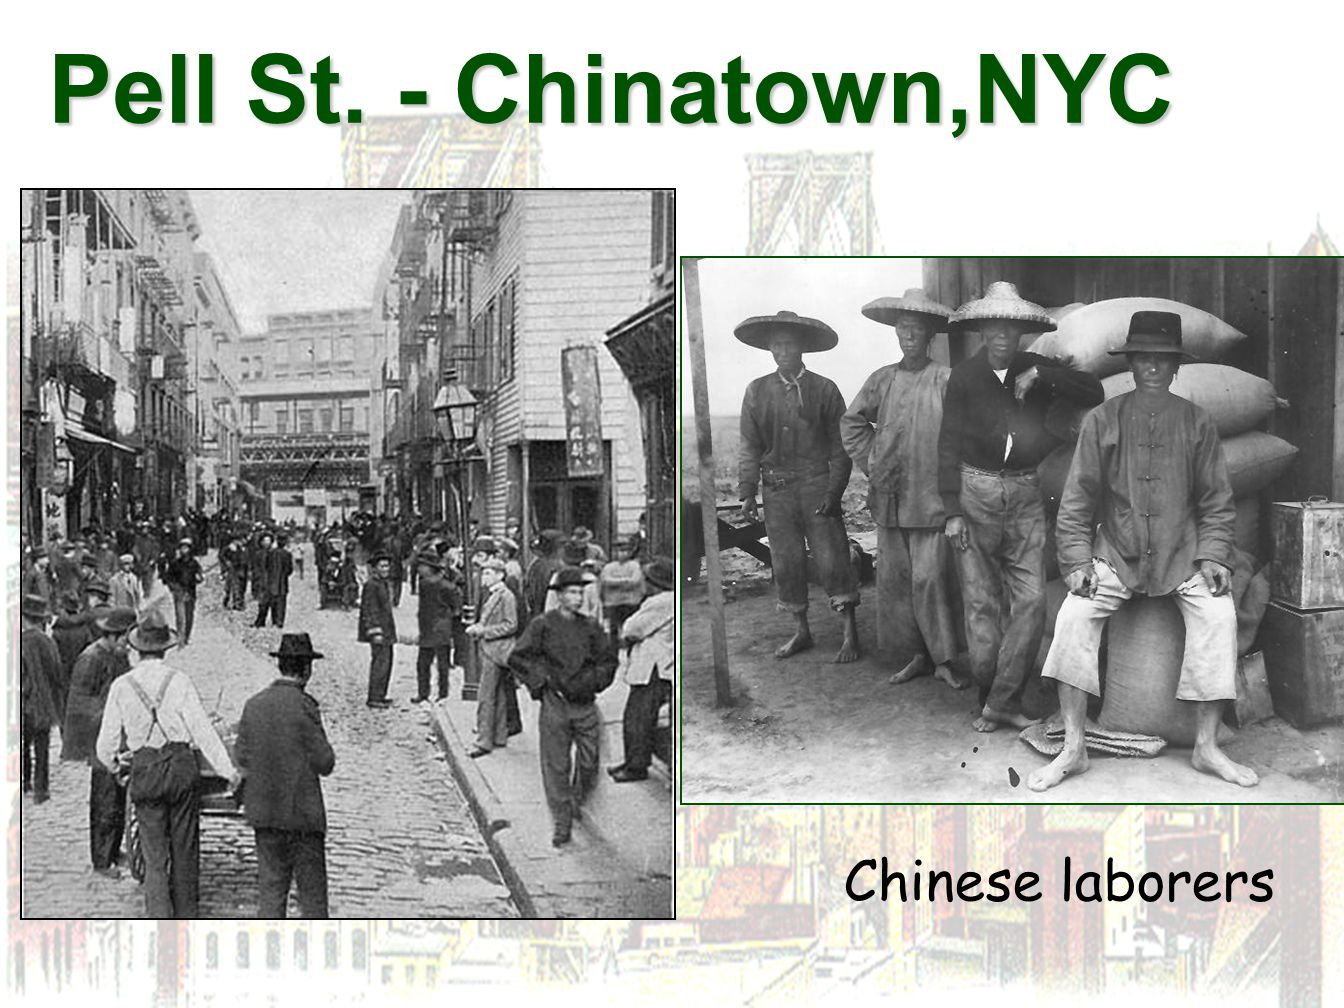 Pell St. - Chinatown,NYC Chinese laborers